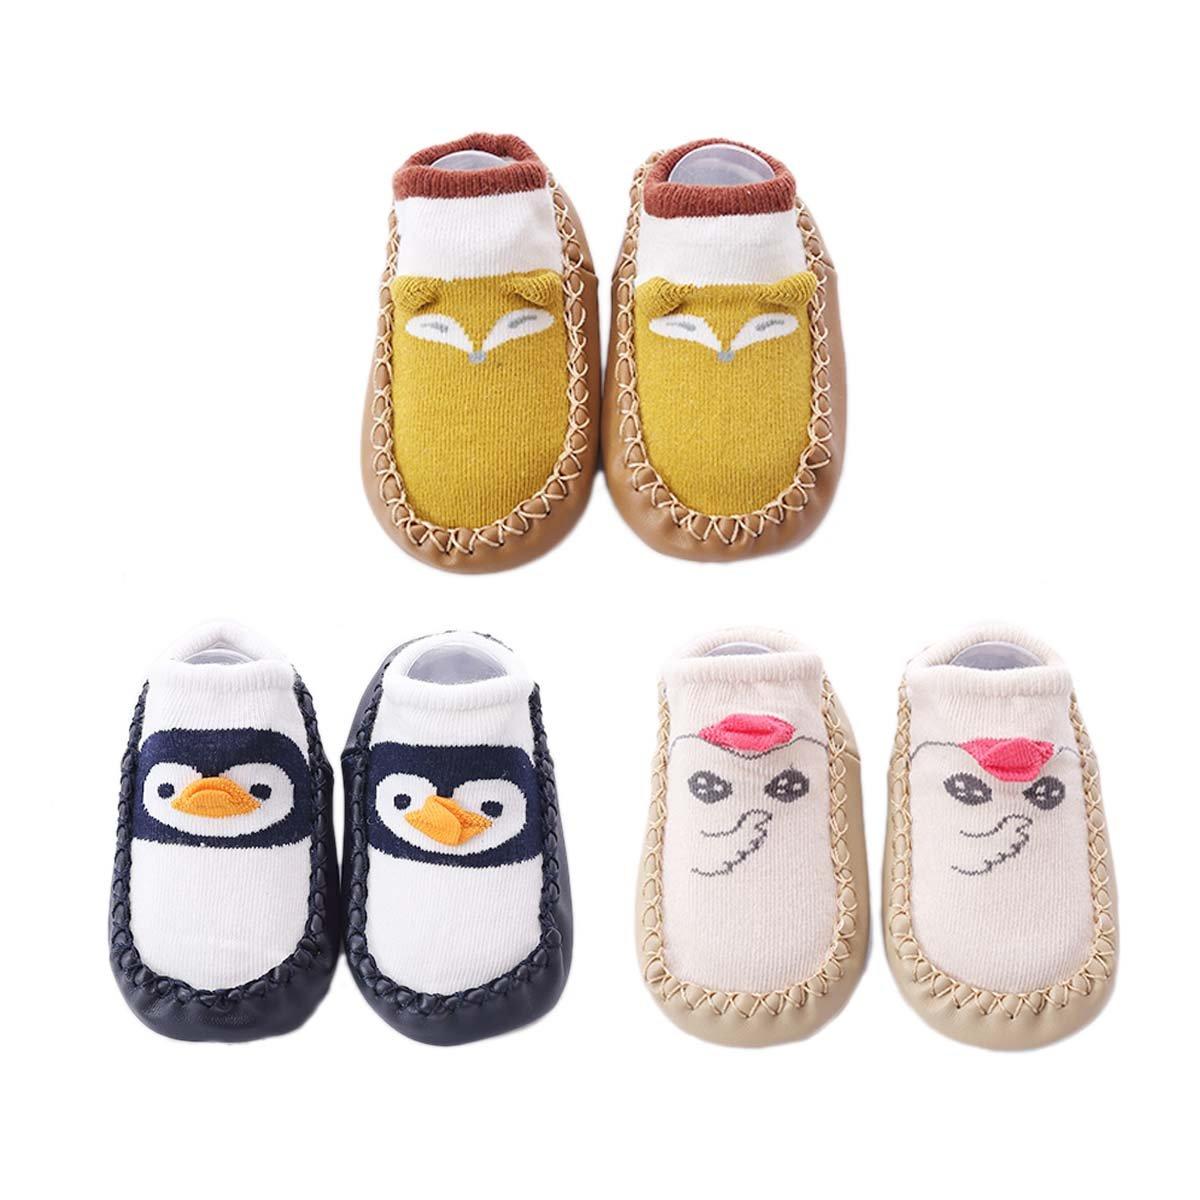 fygood Confezione da 3paia calzini bambino antiscivolo pantofole primo passo Unisex caneton-lapin XS(0-10mois/base 12cm)